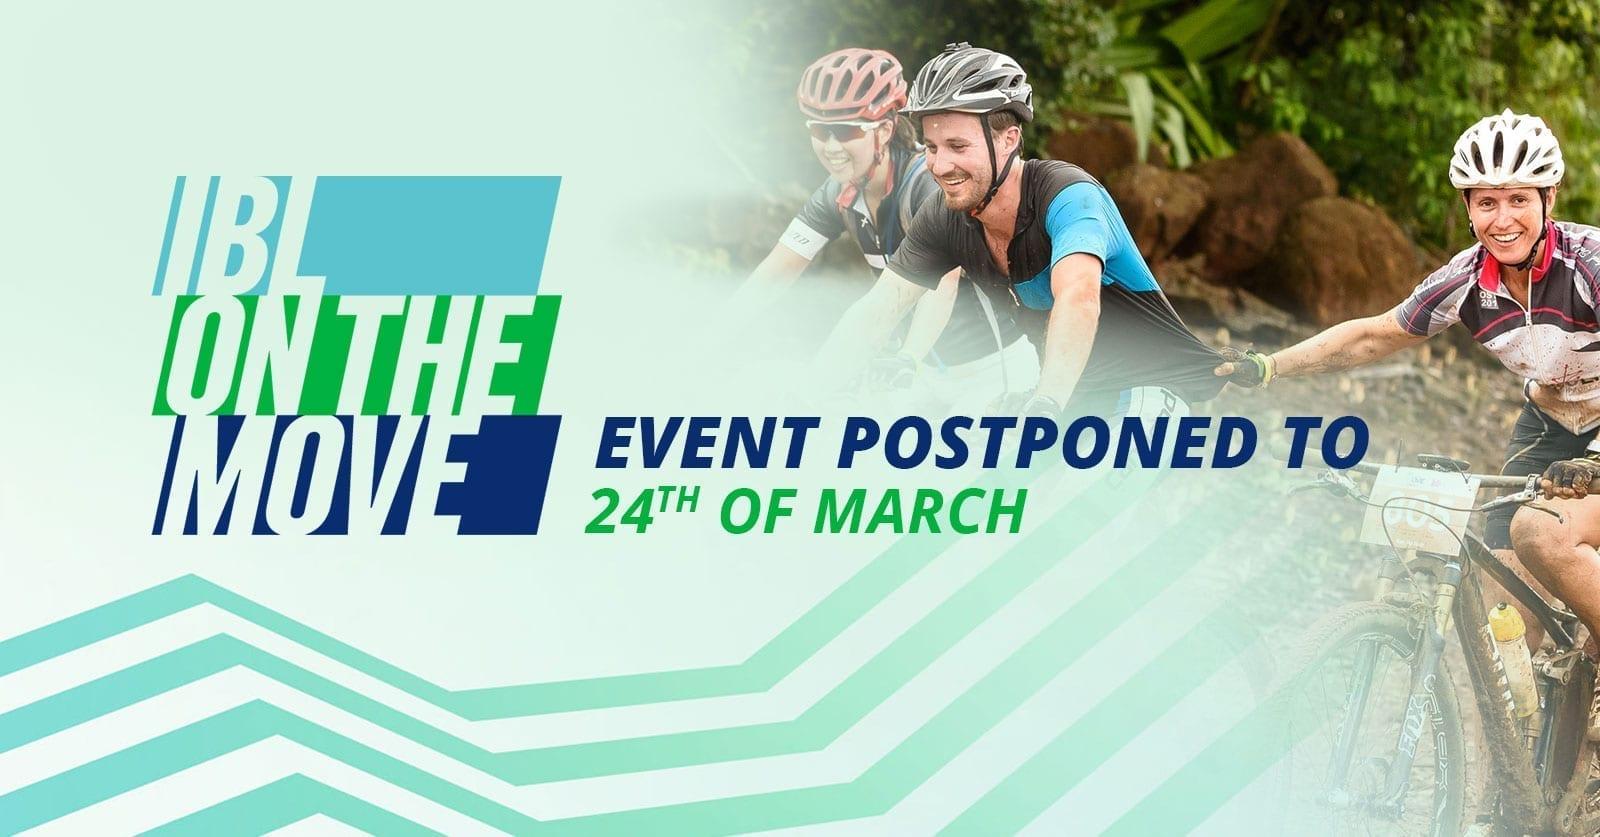 URGENT COMMUNIQUE – EVENT POSTPONED to 24th of March